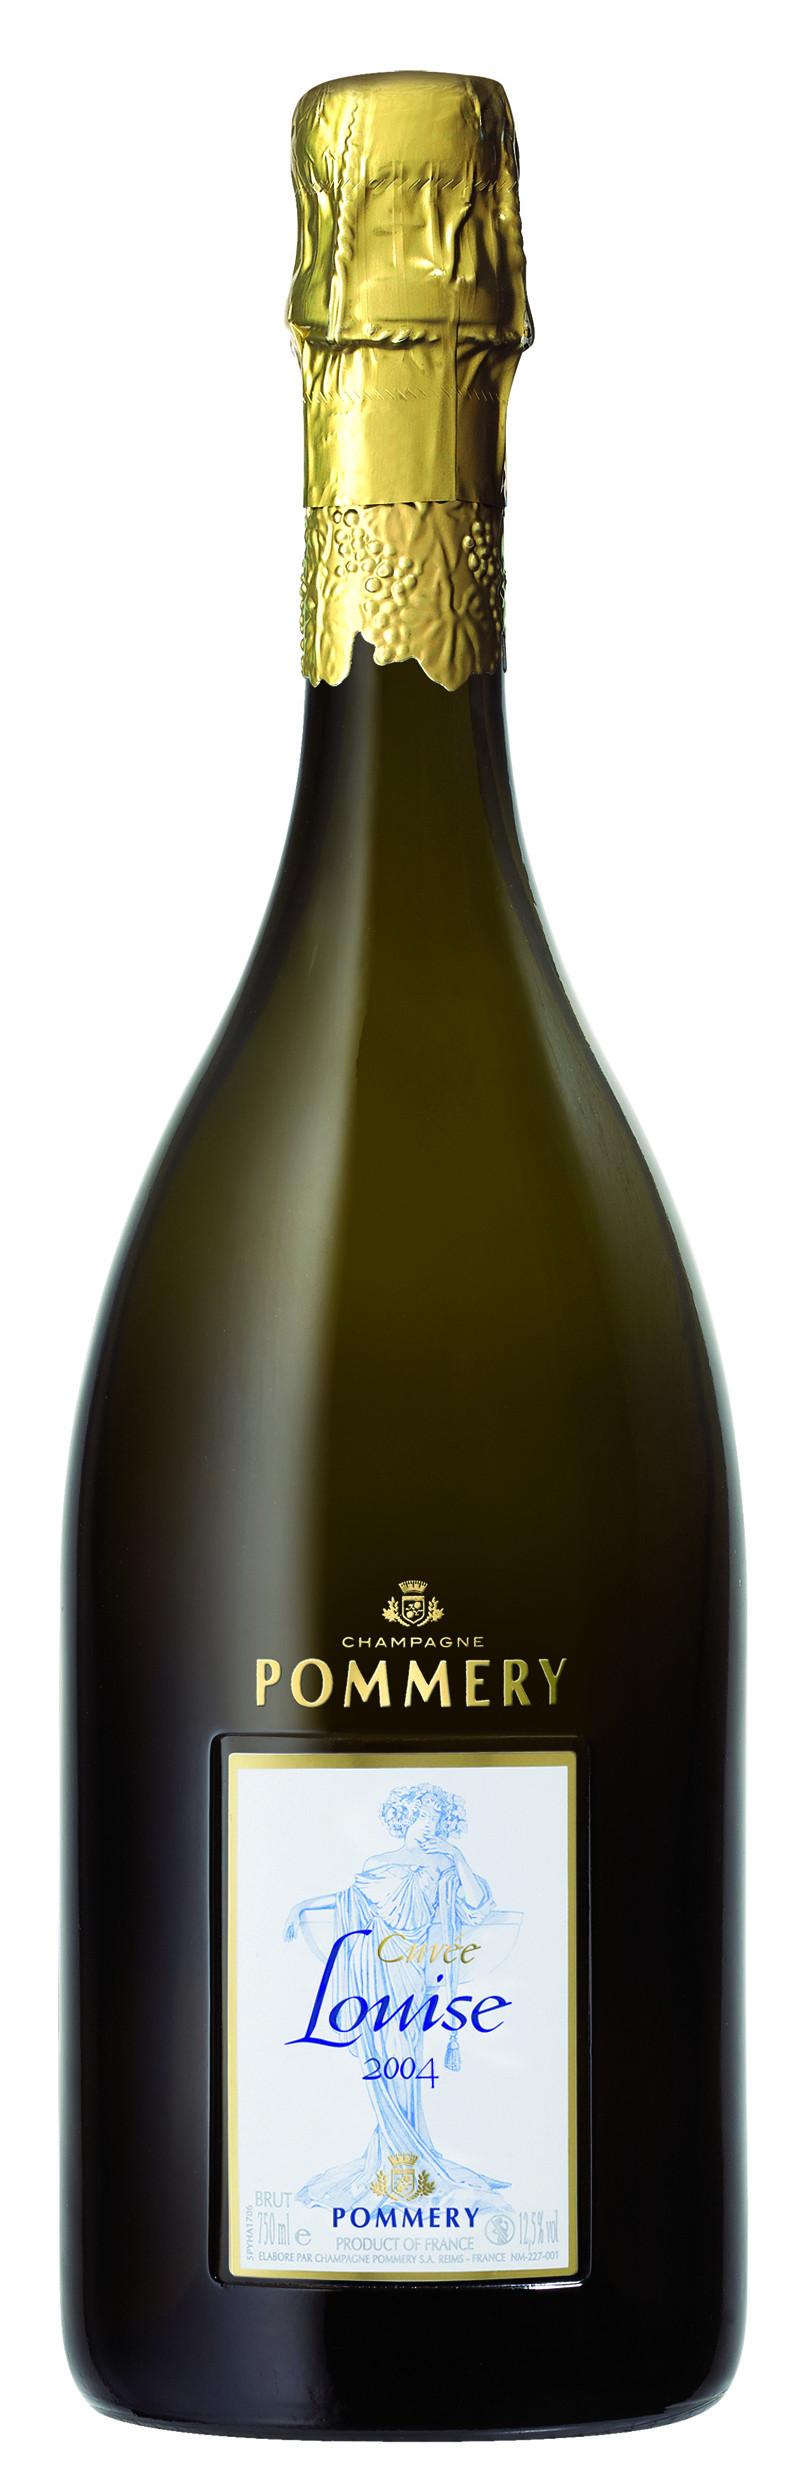 Pommery Champagner Cuvée Louise Brut 2004